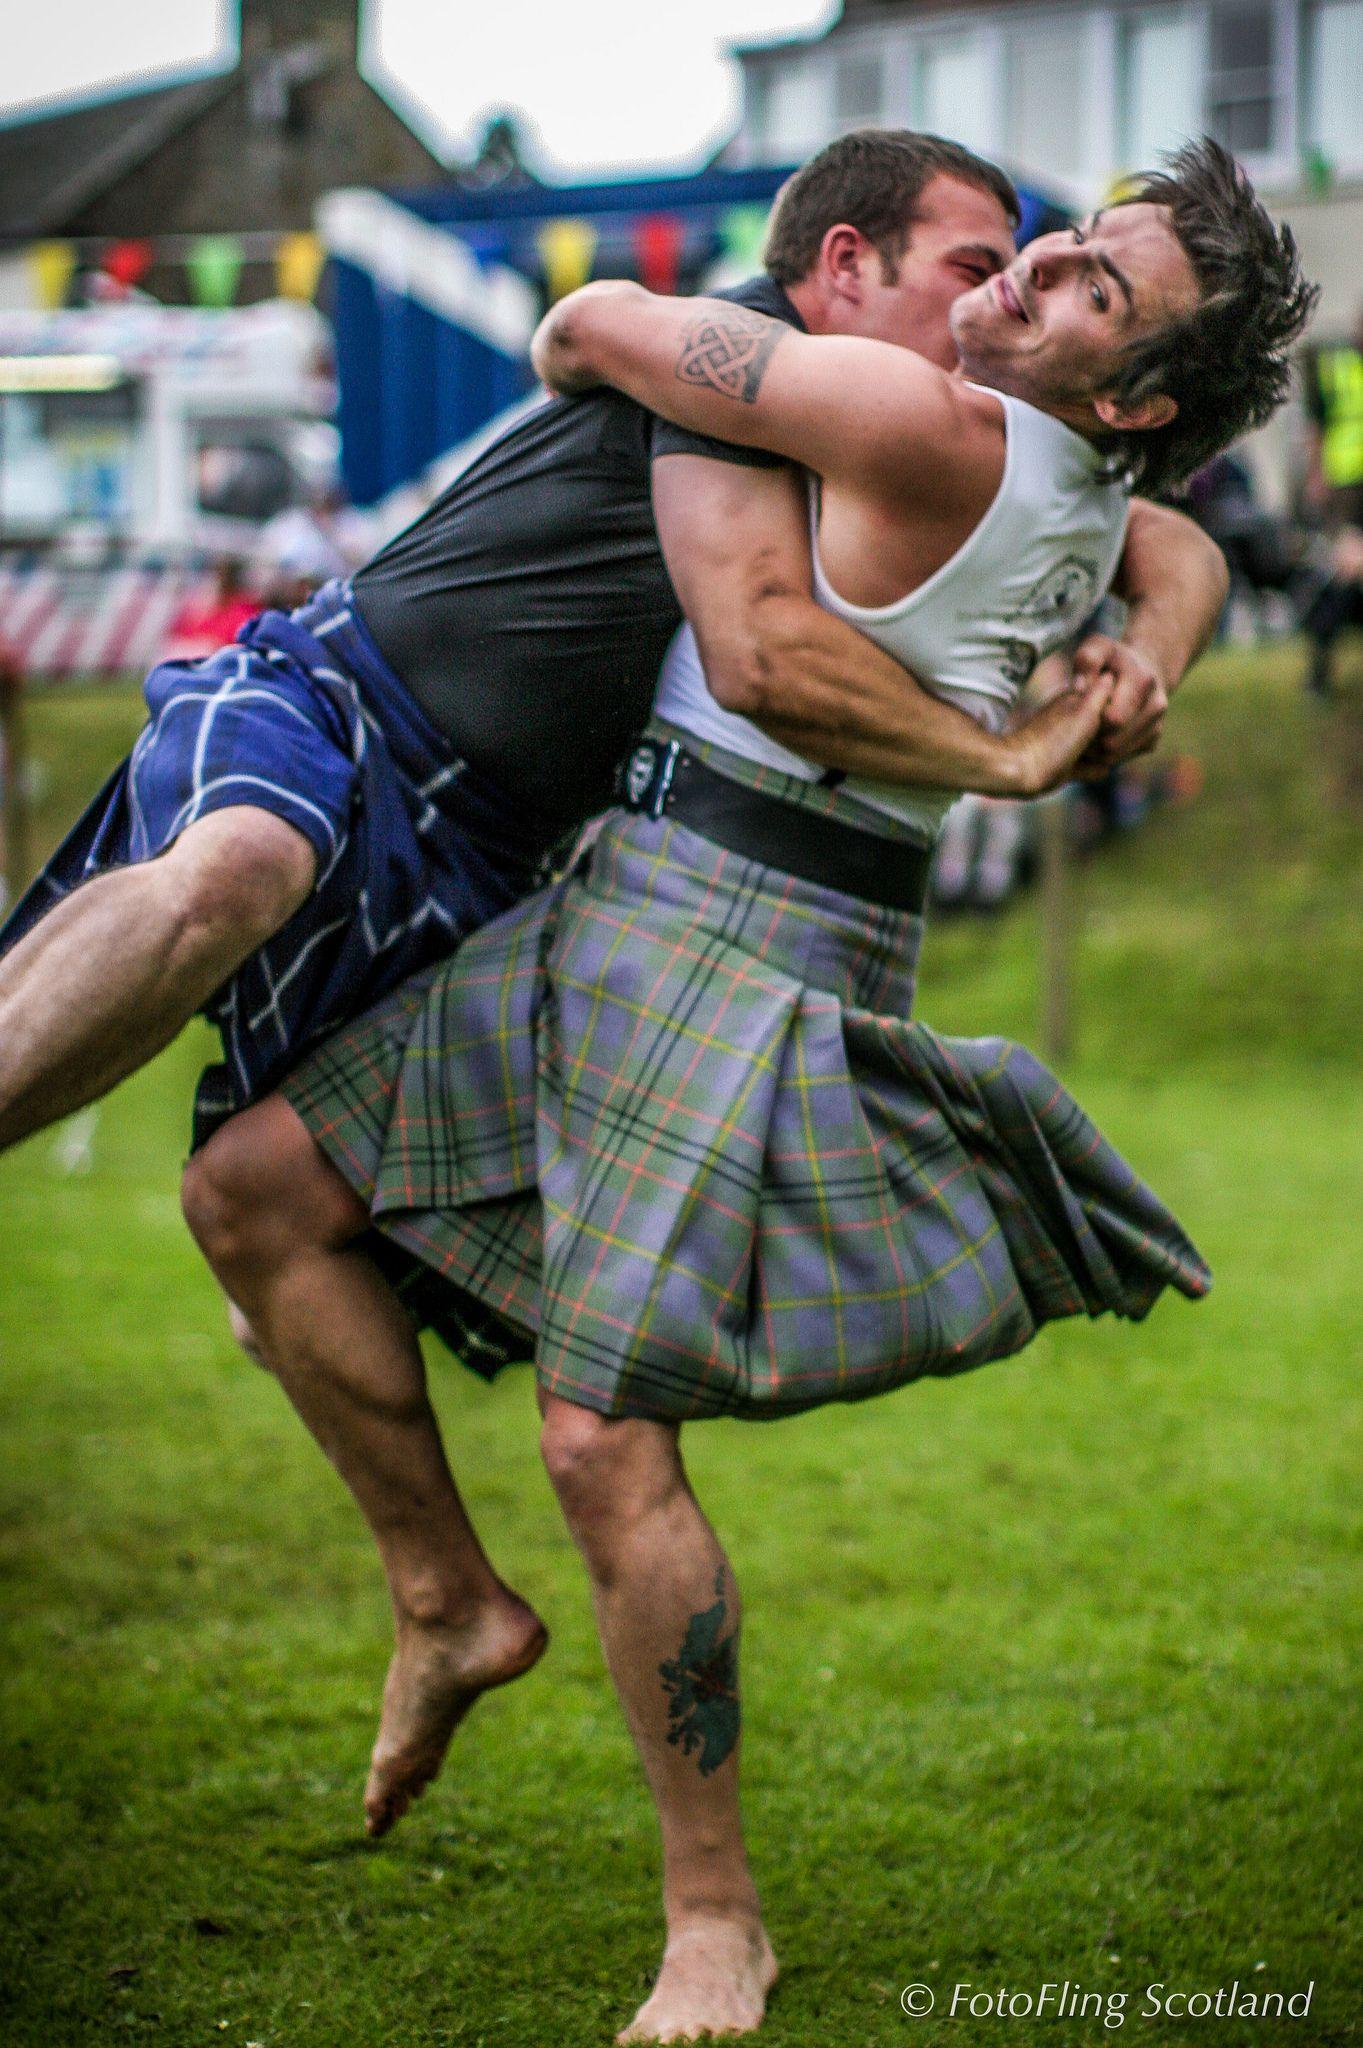 Green Knight Kilt Pin Renaissance Scottish Festival